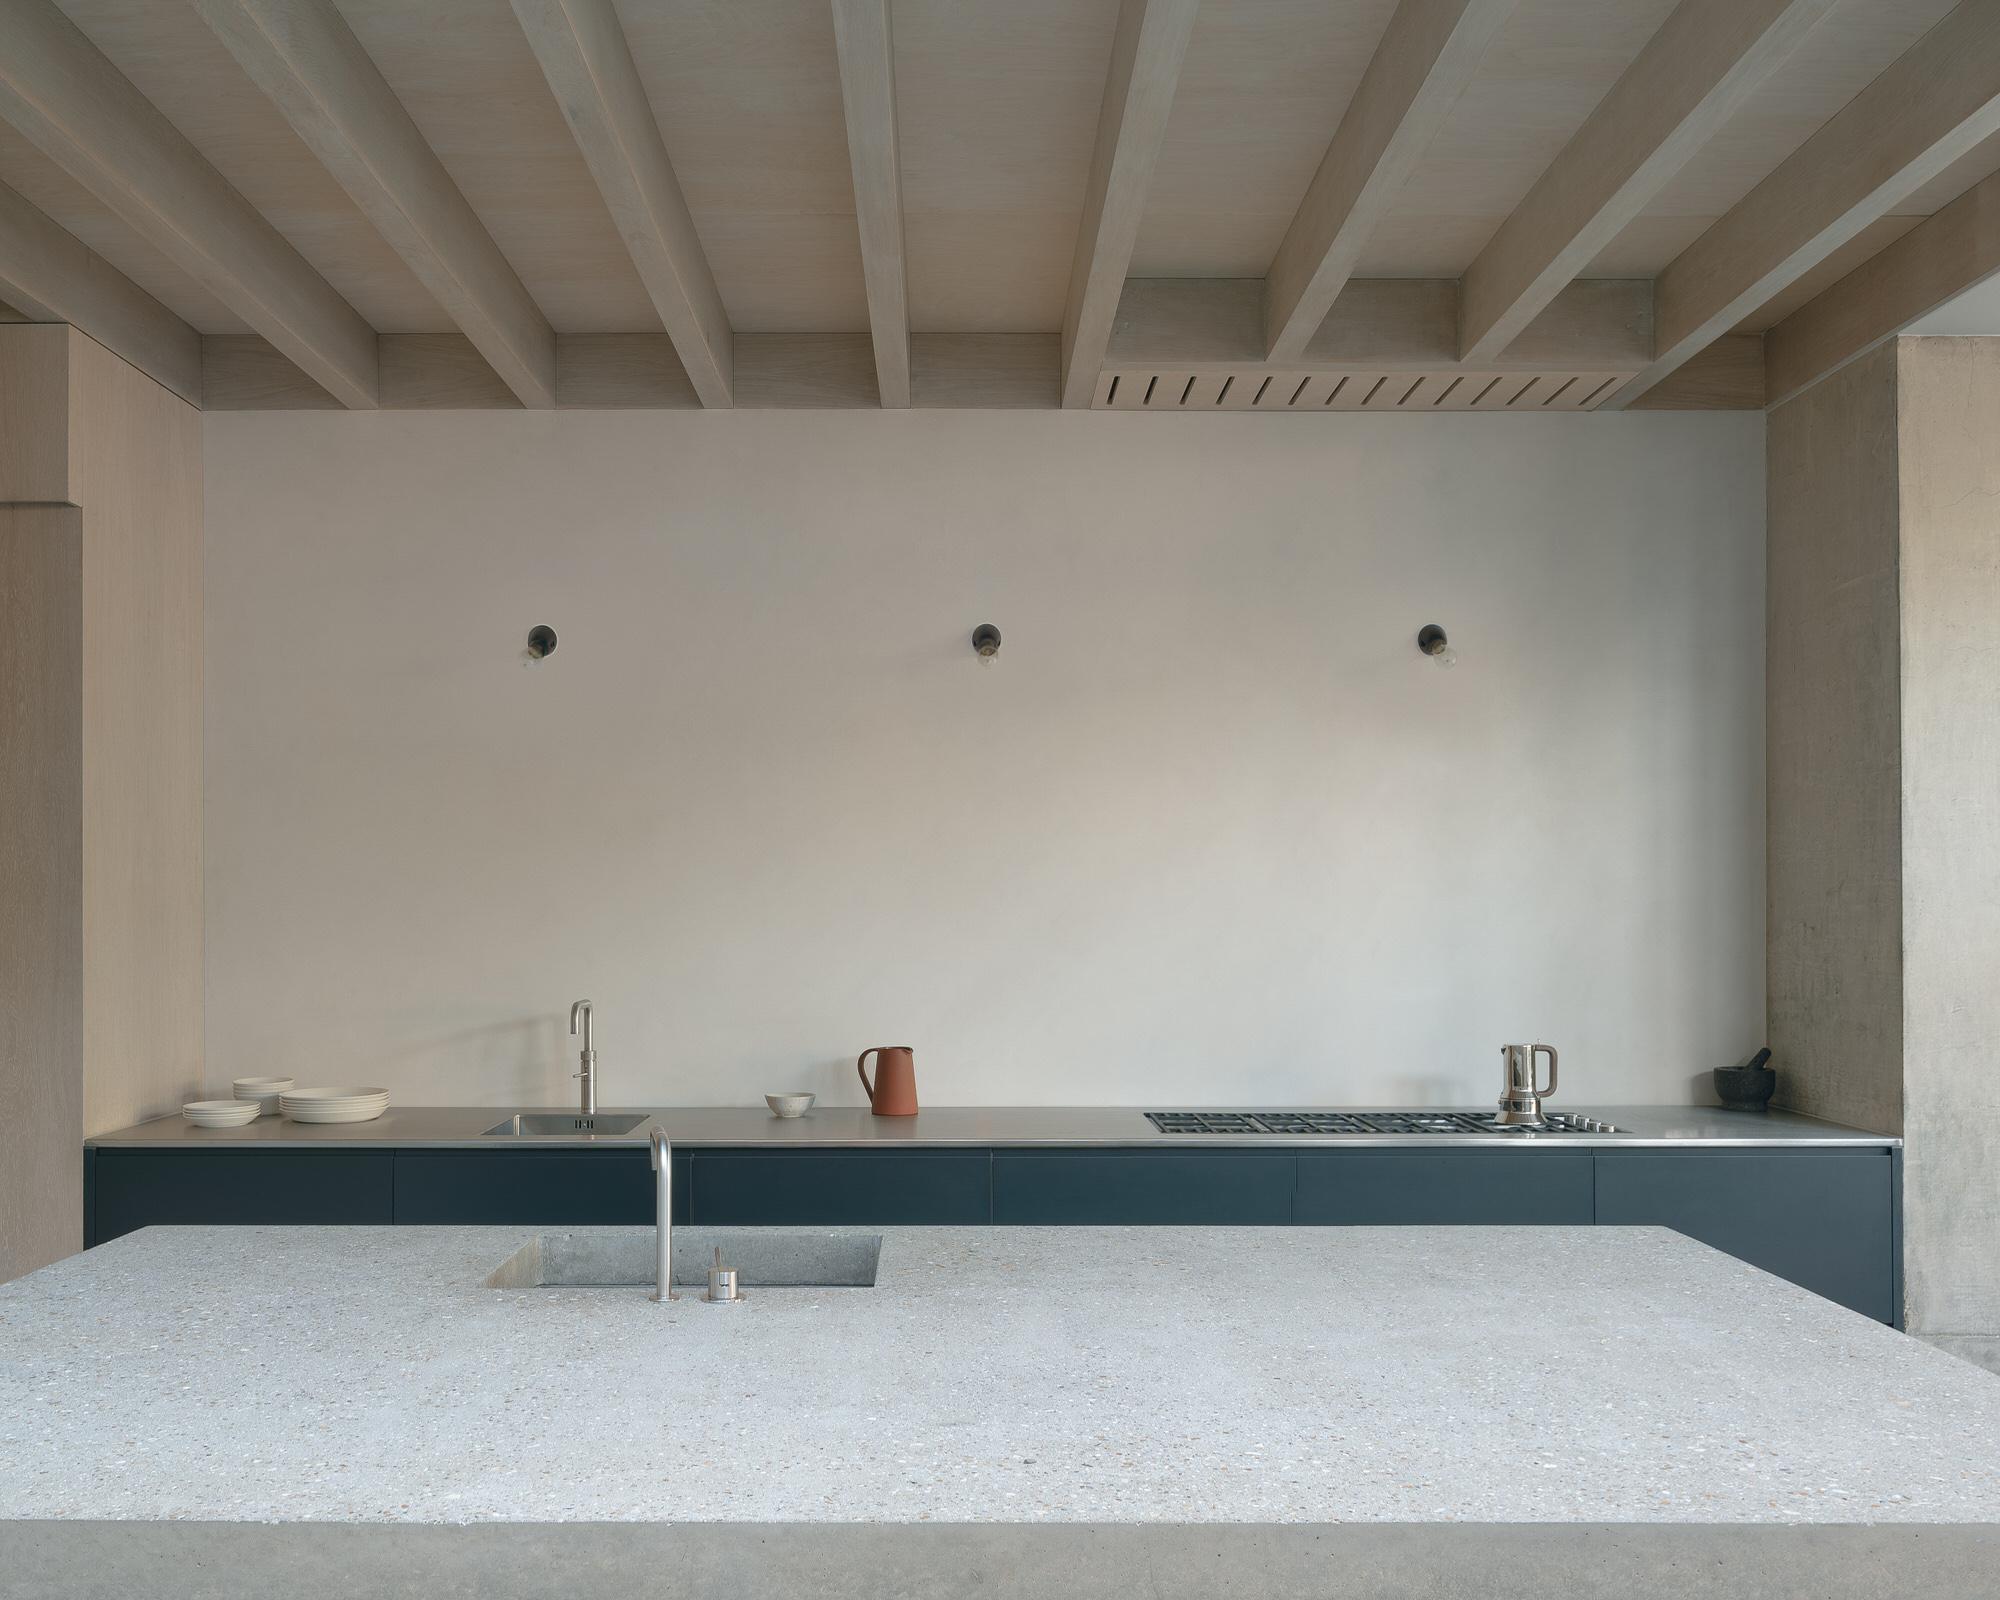 Dgn Studio Concrete Plinth House East London Residential Architecture Photo Nick Dearden Yellowtrace 04